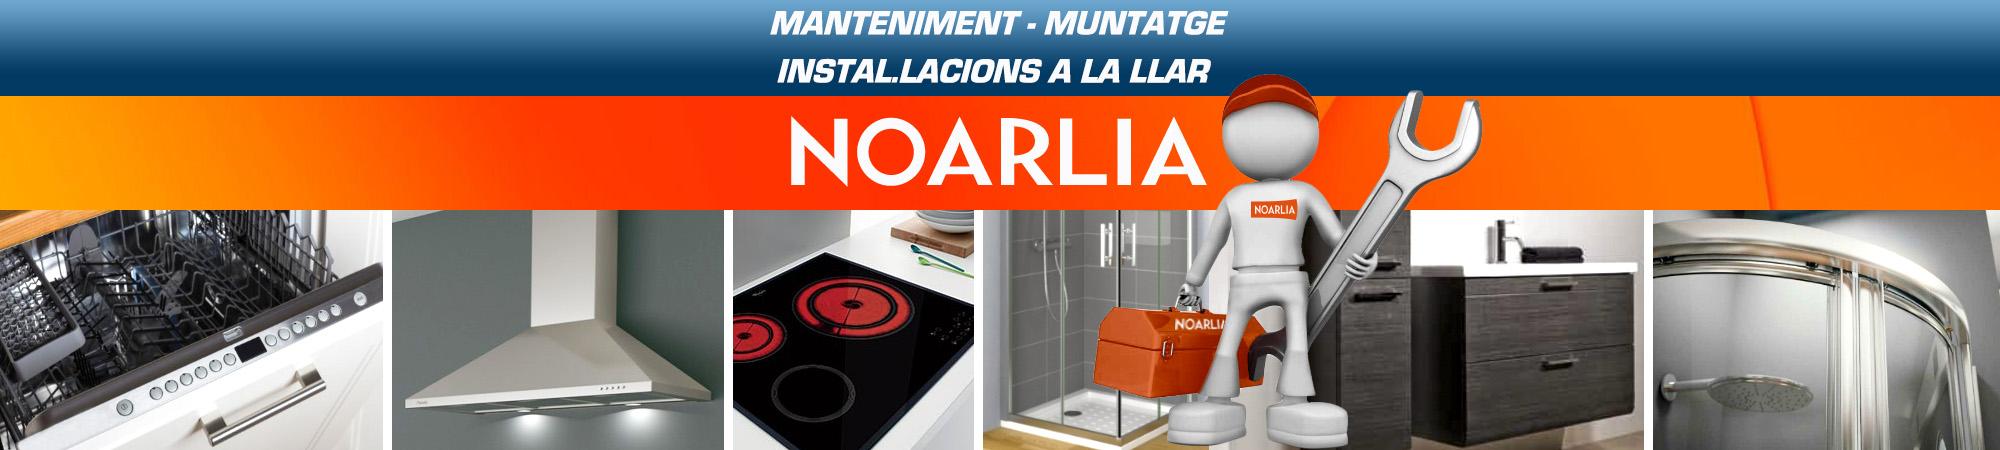 Reparación electrodomésticos Igualada Anoia